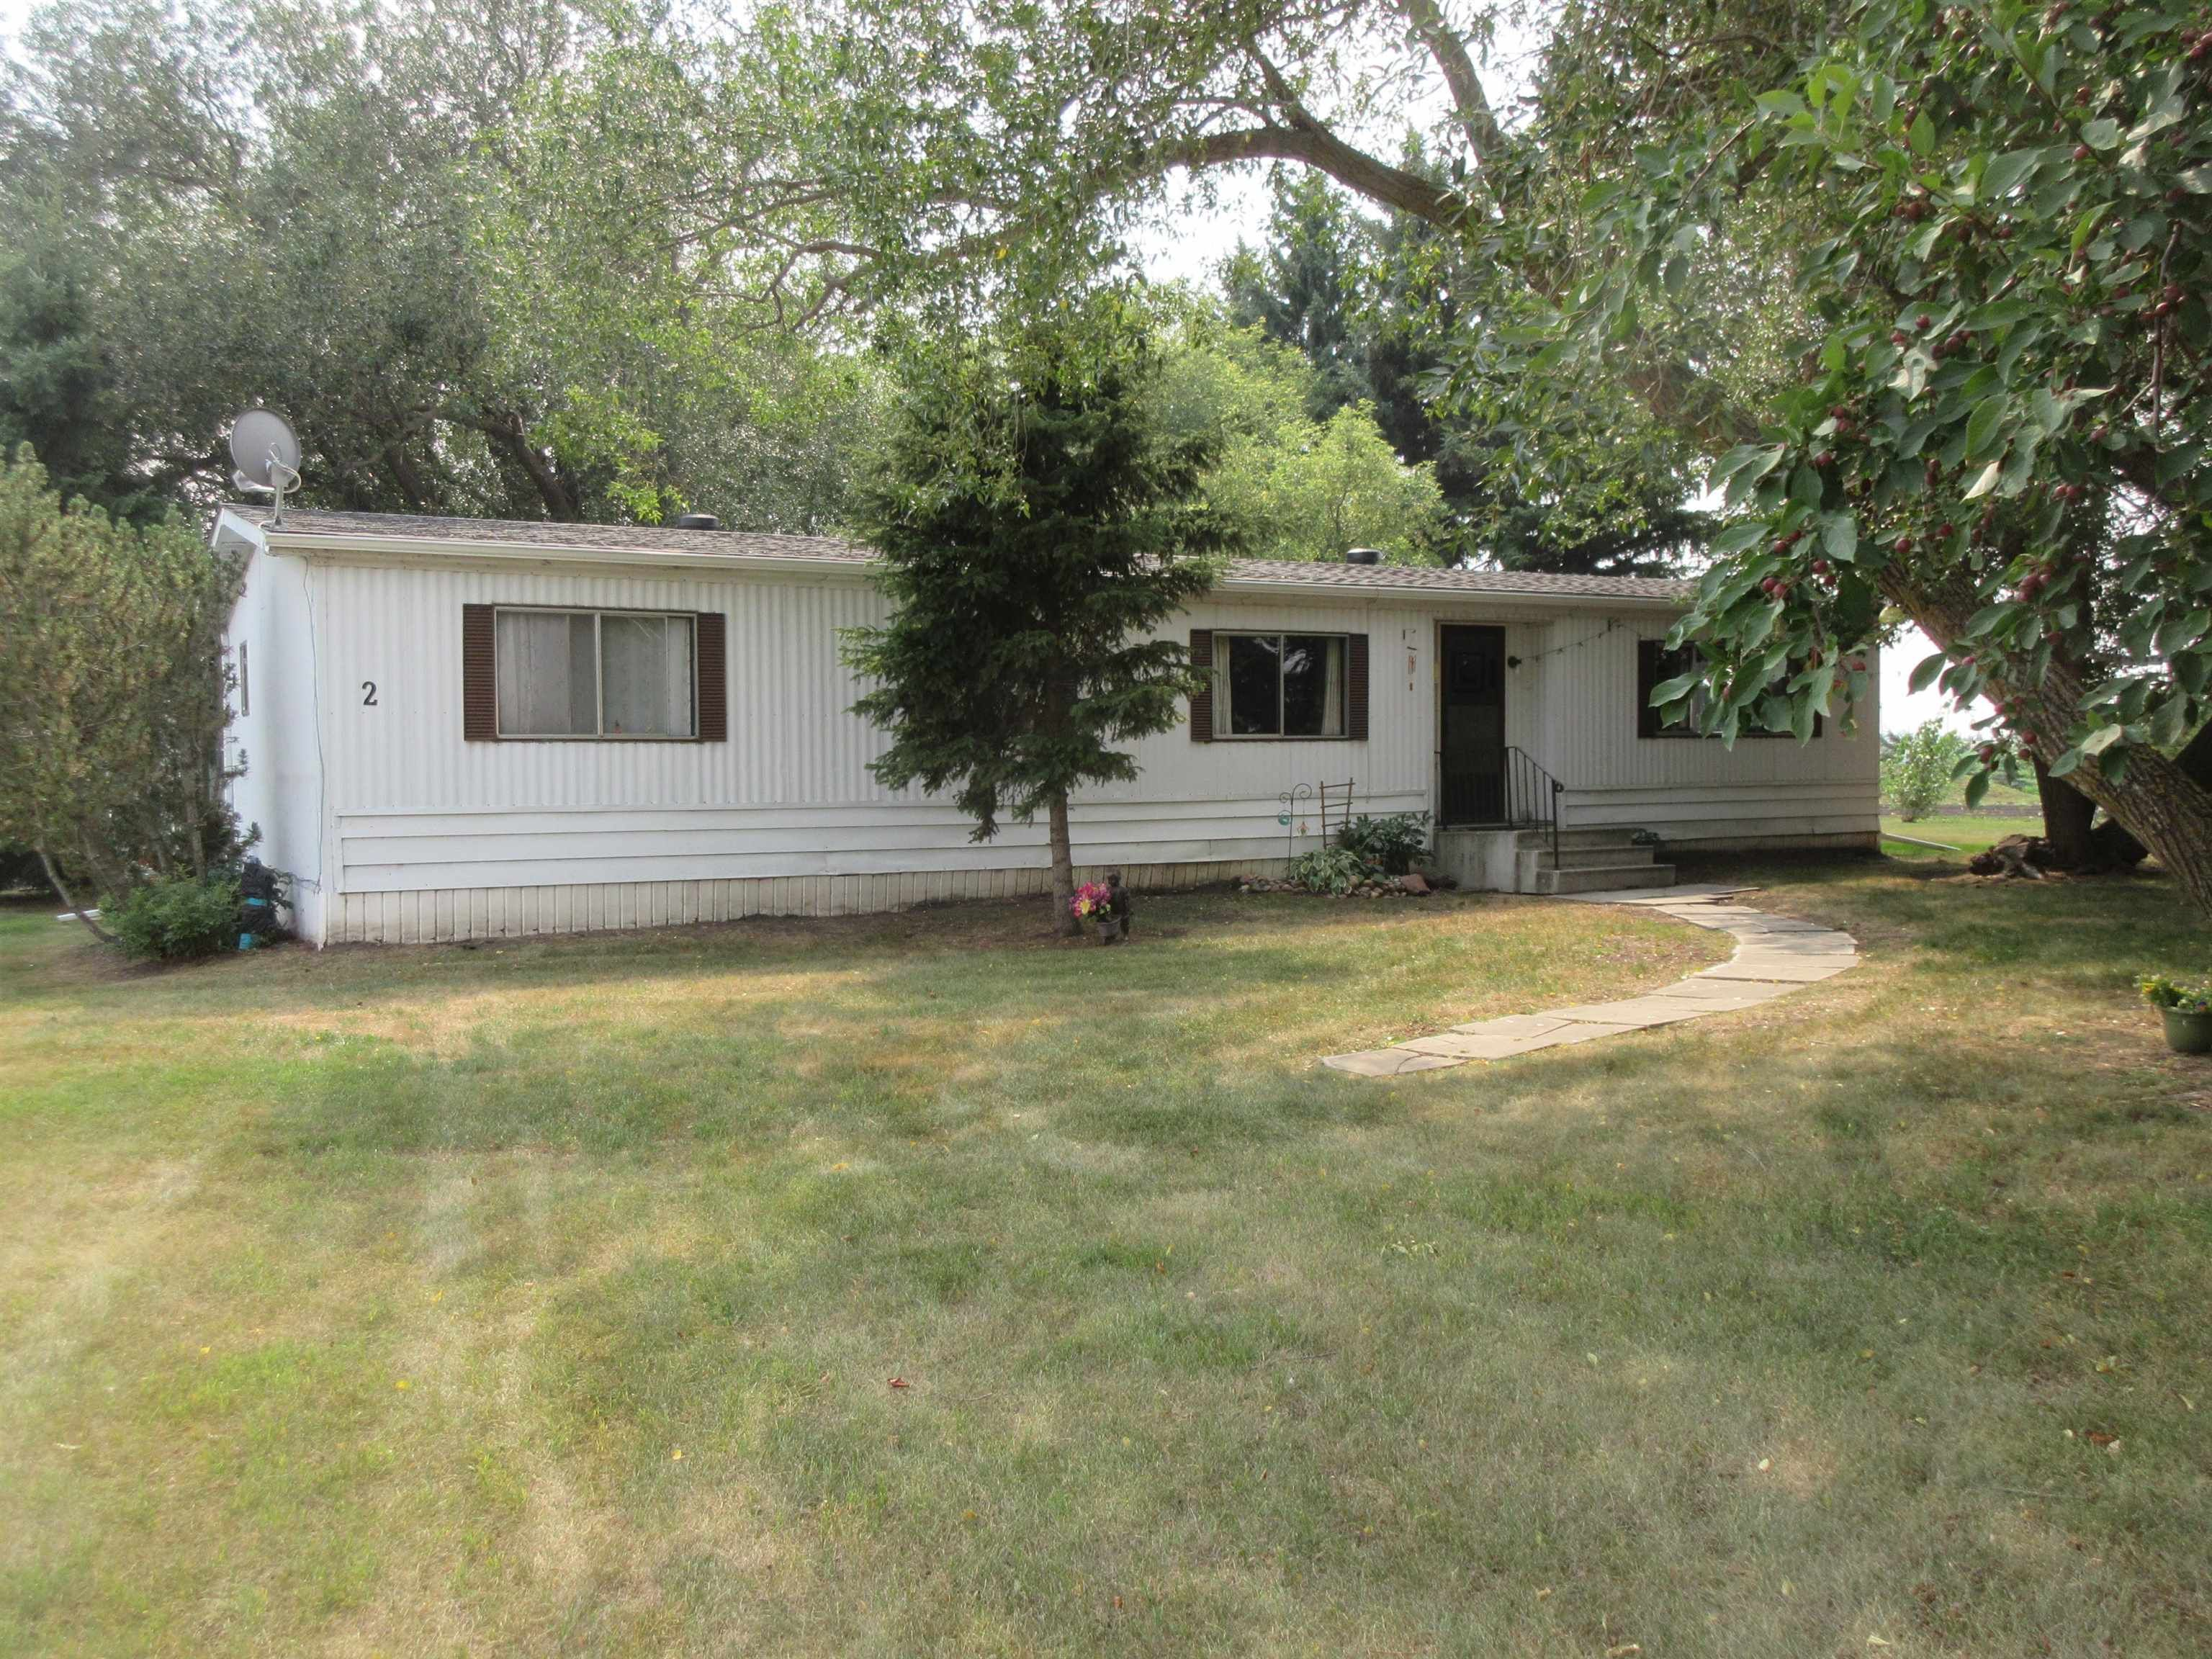 Main Photo: 24123 HWY 37: Rural Sturgeon County House for sale : MLS®# E4259044